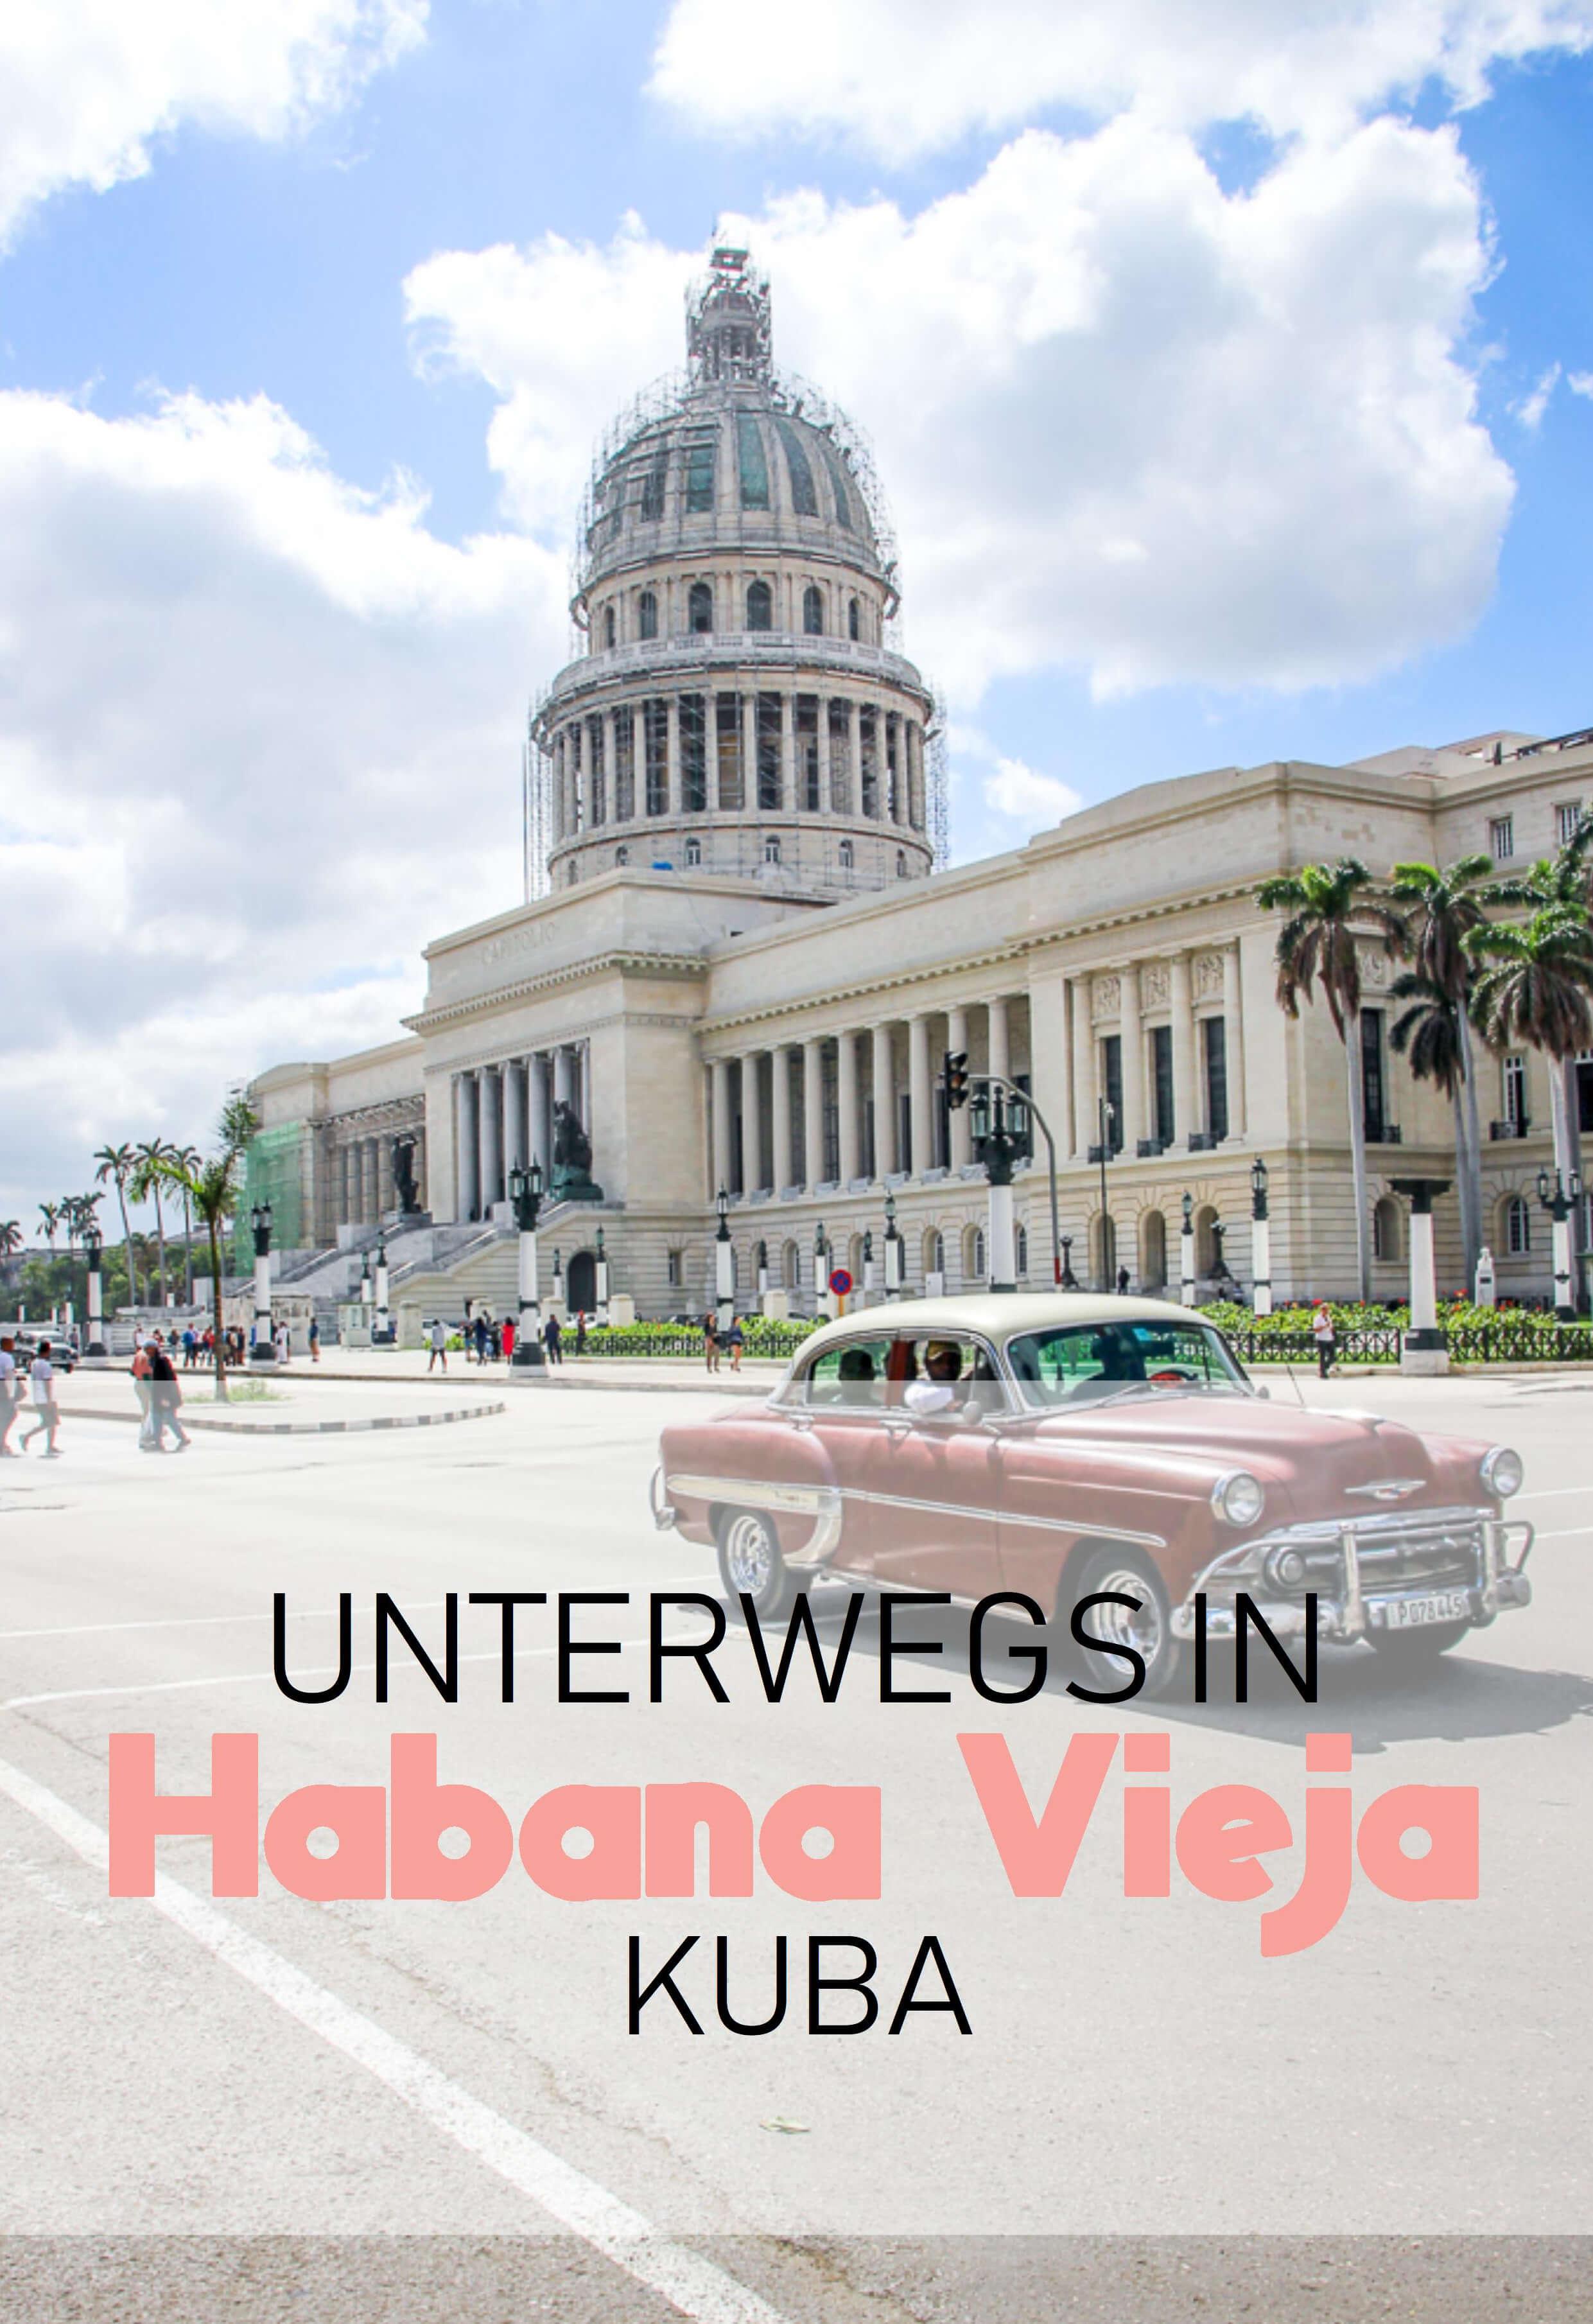 Kuba Havanna Cuba La Habana Vieja Reisetipps tantedine